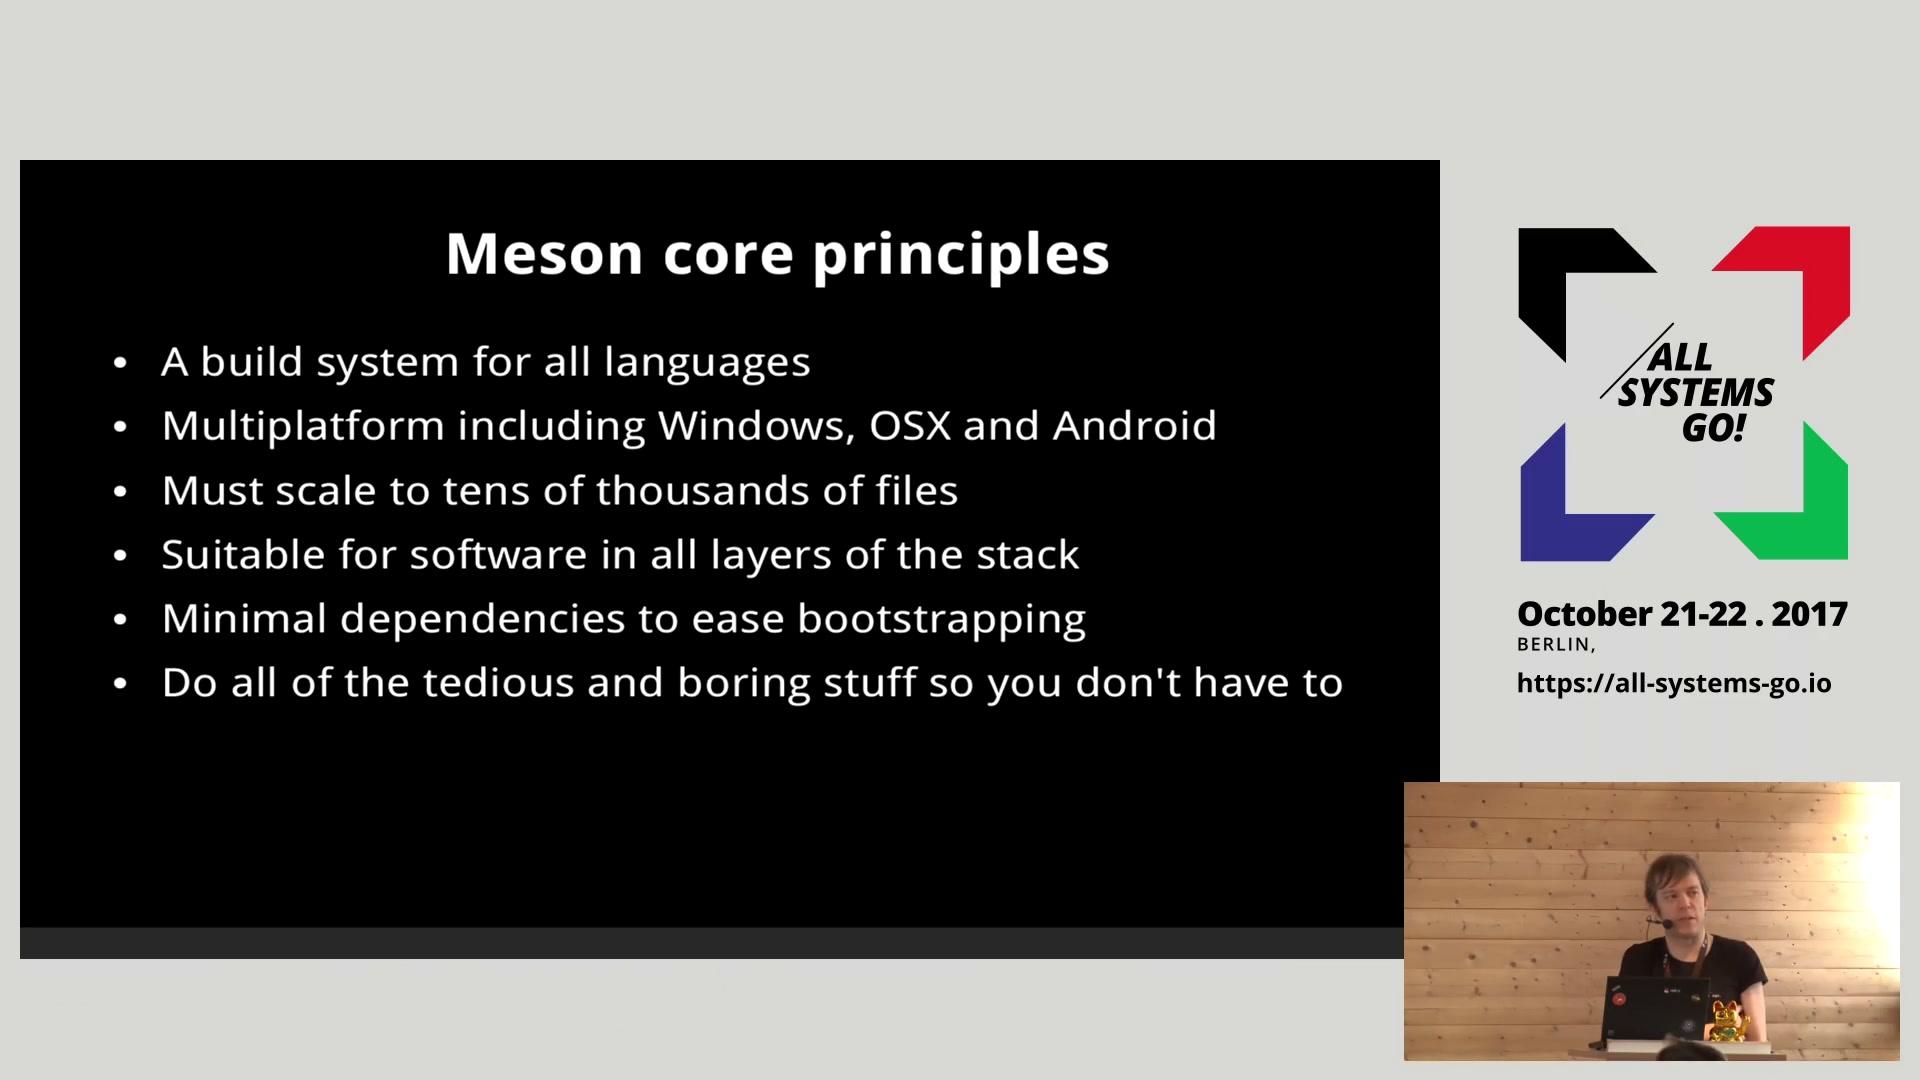 media ccc de - Meson and the changing Linux build landscape